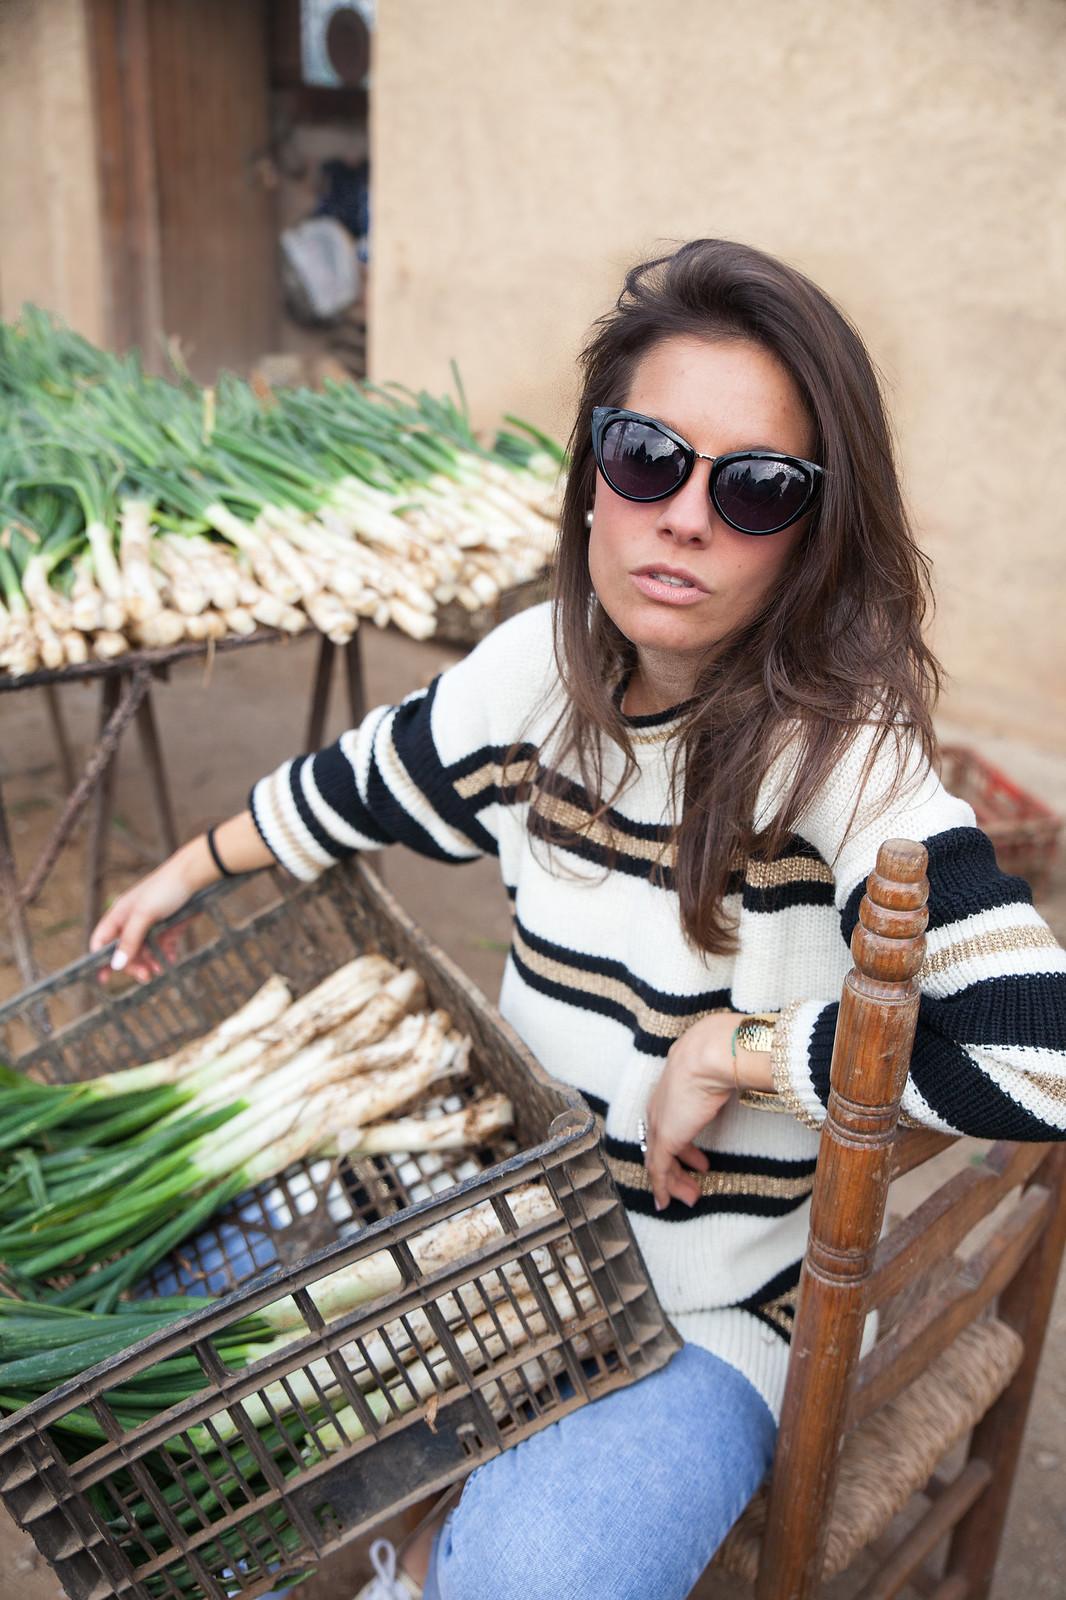 LOOK CASUAL FIN DE SEMANA CON JERSEY DE RAYAS theguestgirl fashion blogger influencer barcelona supreme jeans mango nueva coleccion primavera verano brand ambassador calçotada laura santolaria